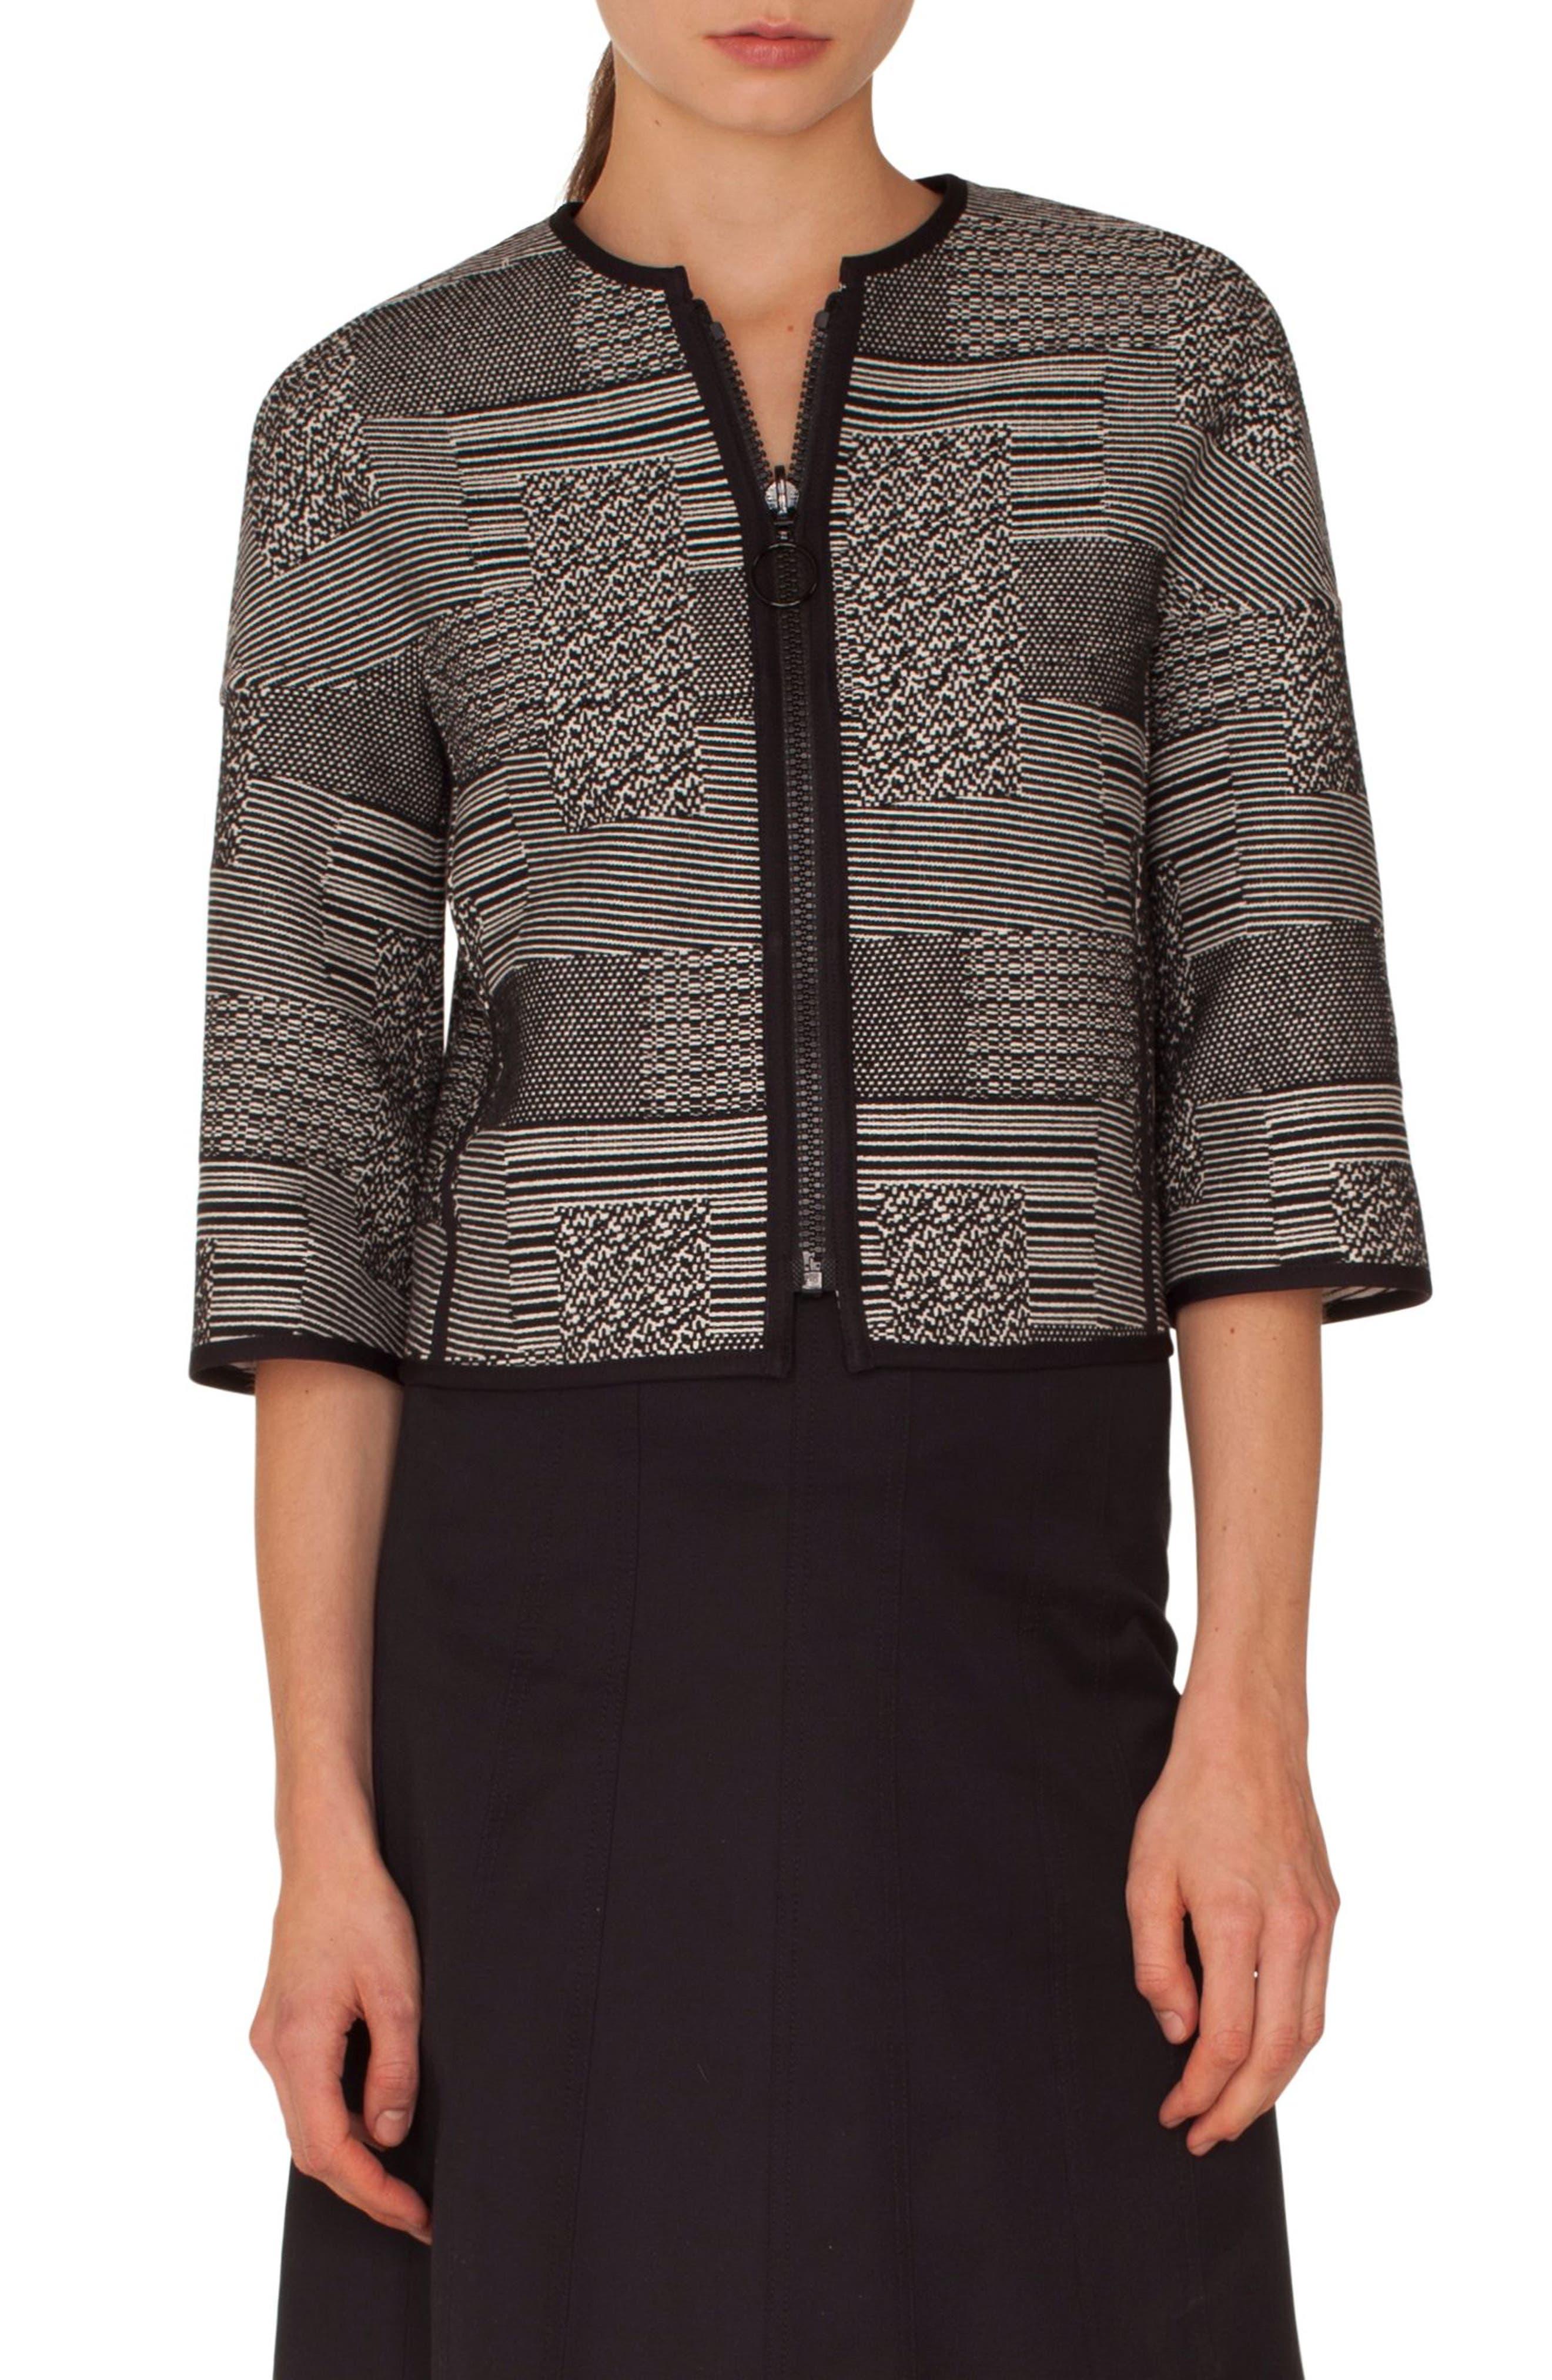 Graphic Jacquard Jacket,                         Main,                         color, SILVER-CREAM